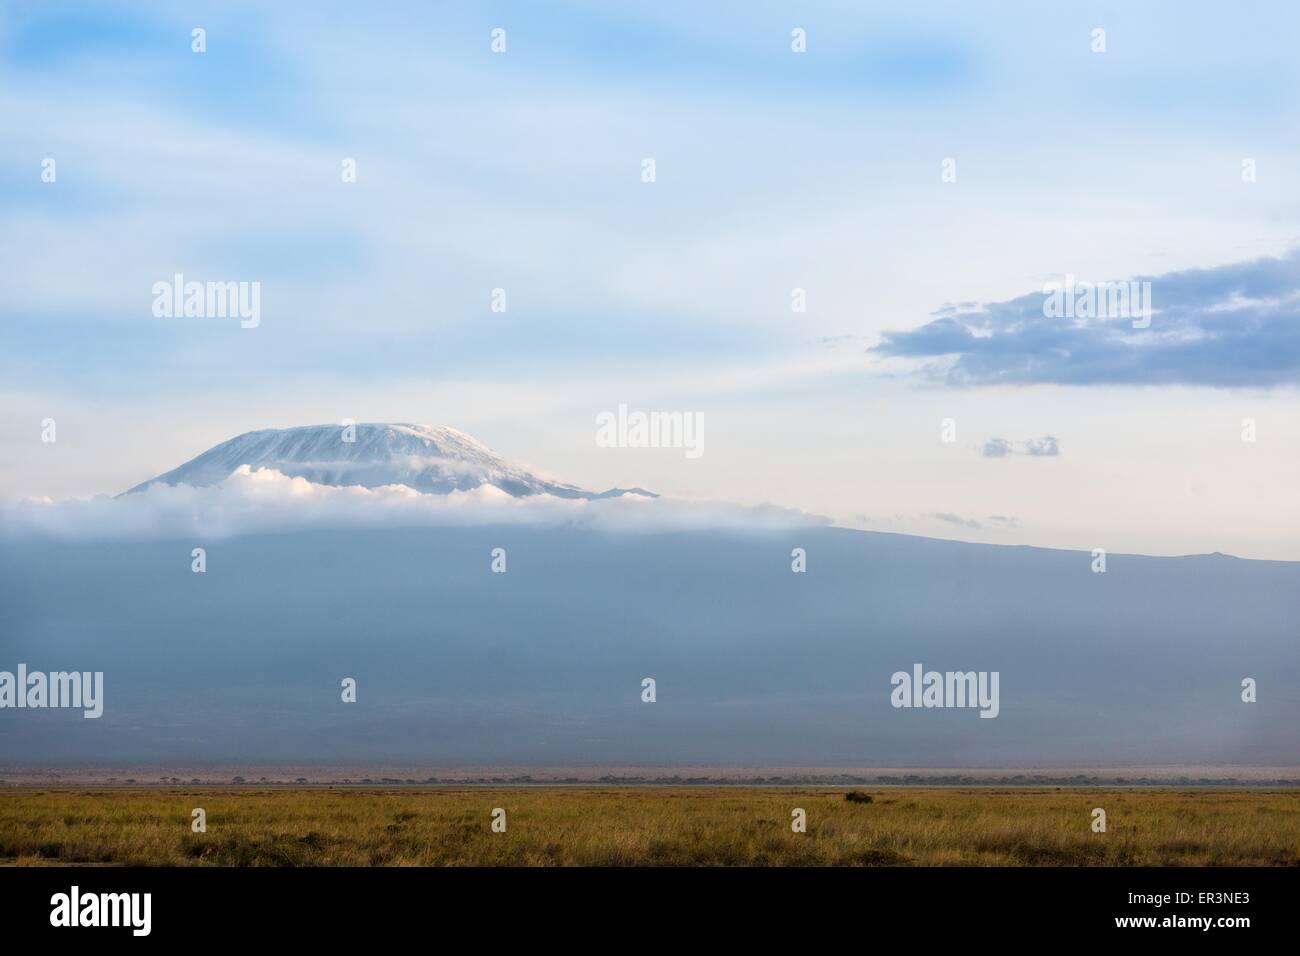 Kilimanjaro the big mountain in Africa - Stock Image